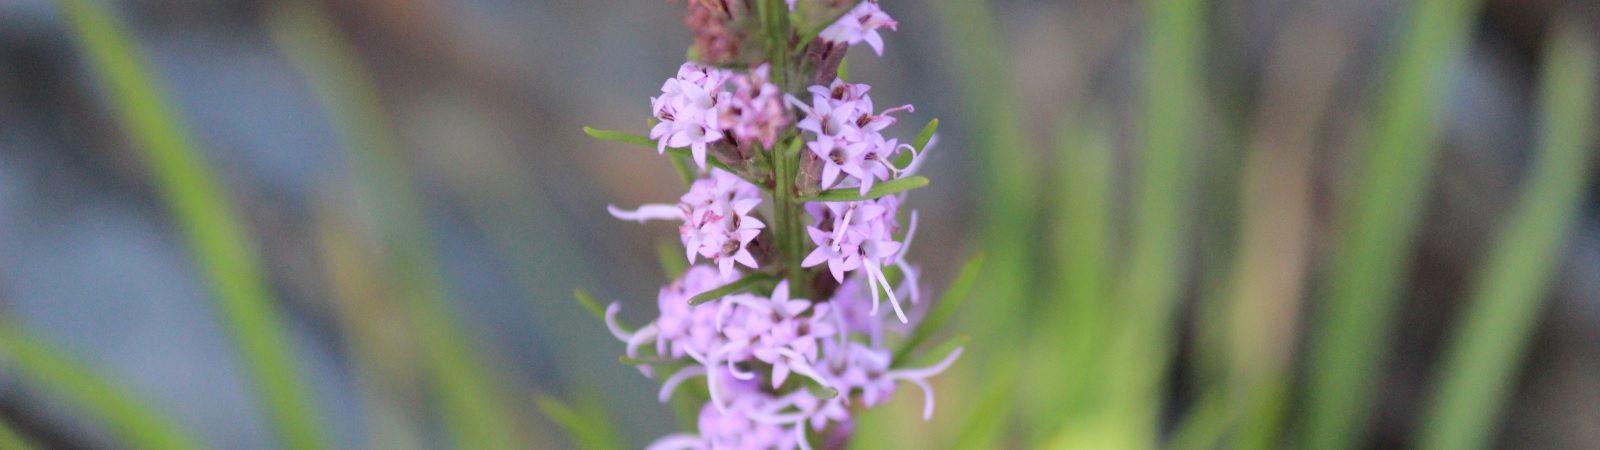 ocoee river wild flower